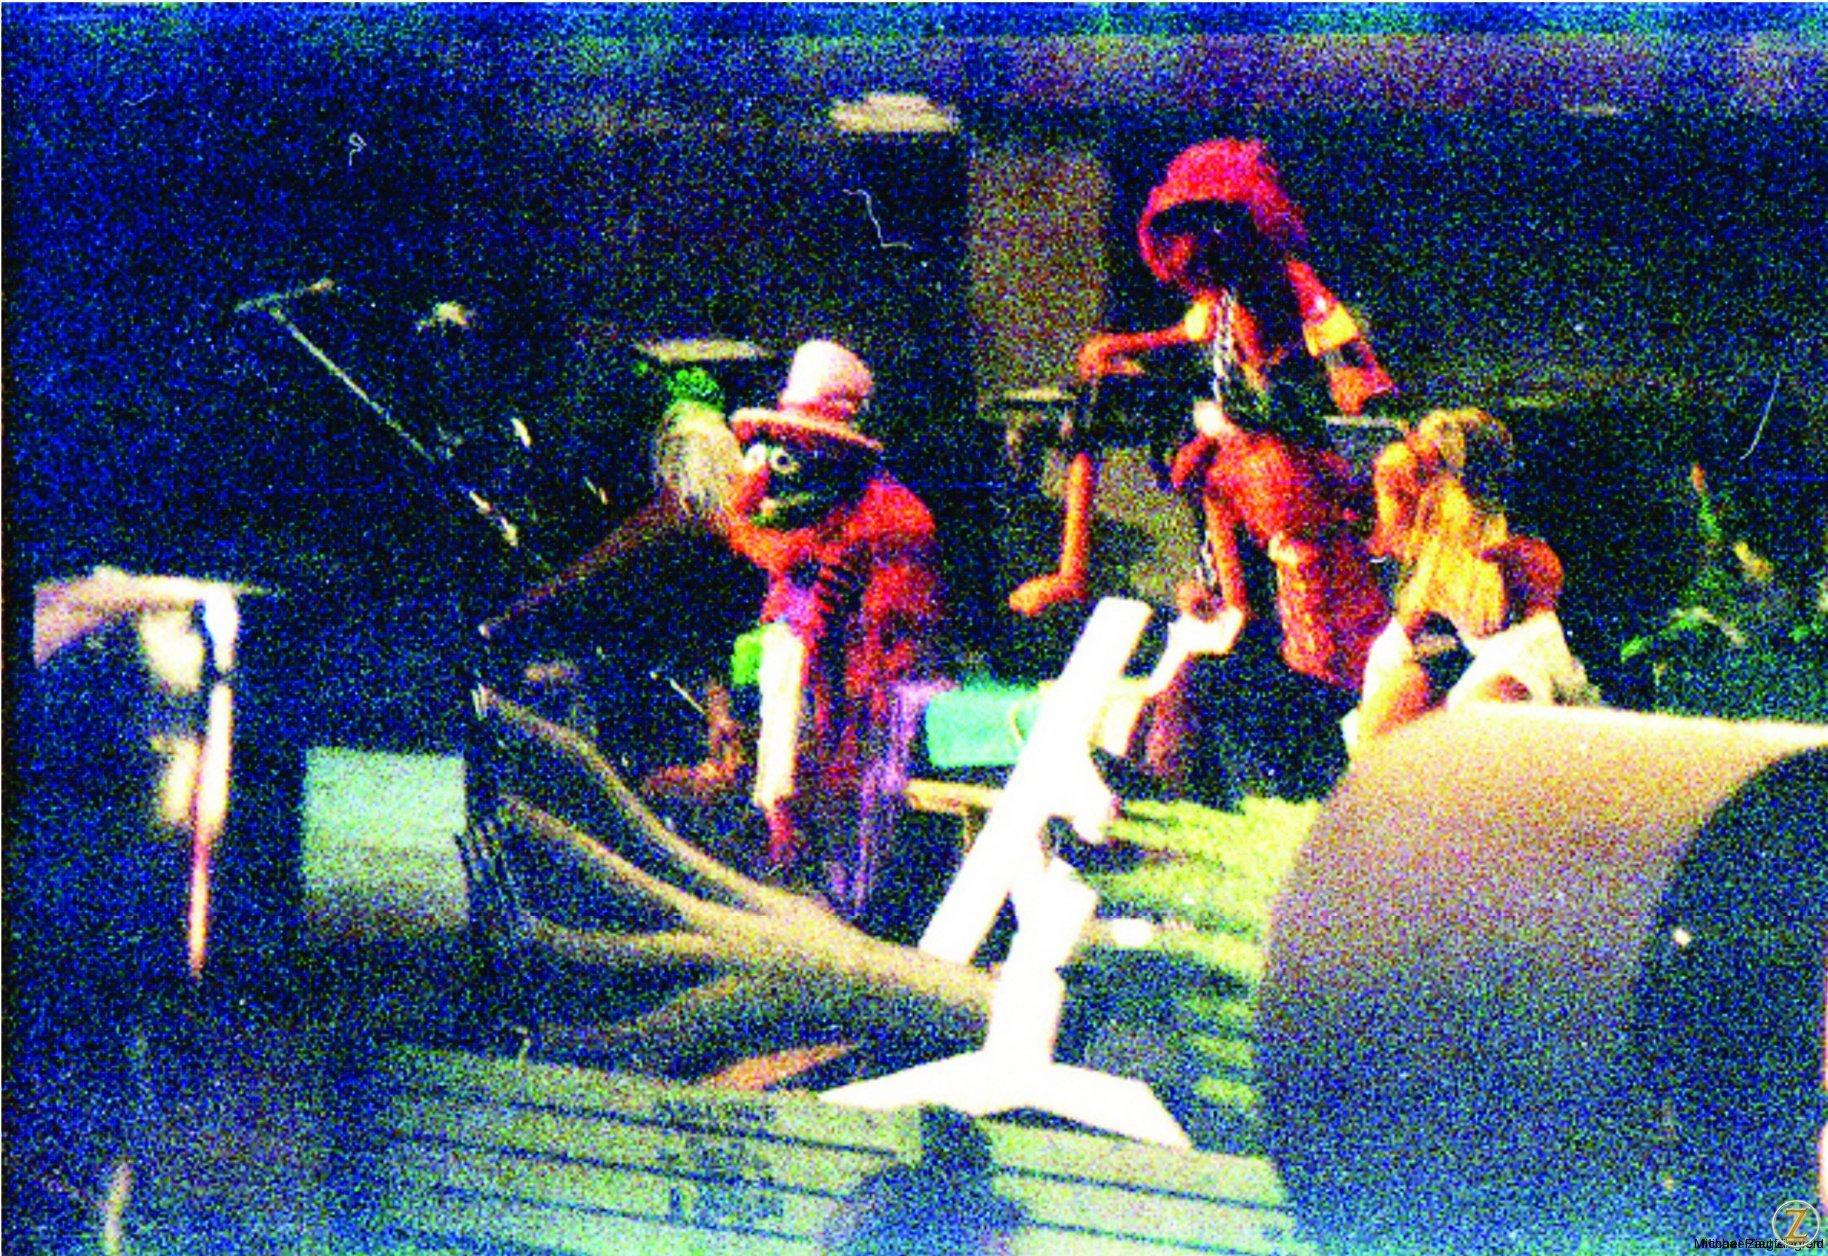 Electric Mayhem Band - Muppet Movie 1979